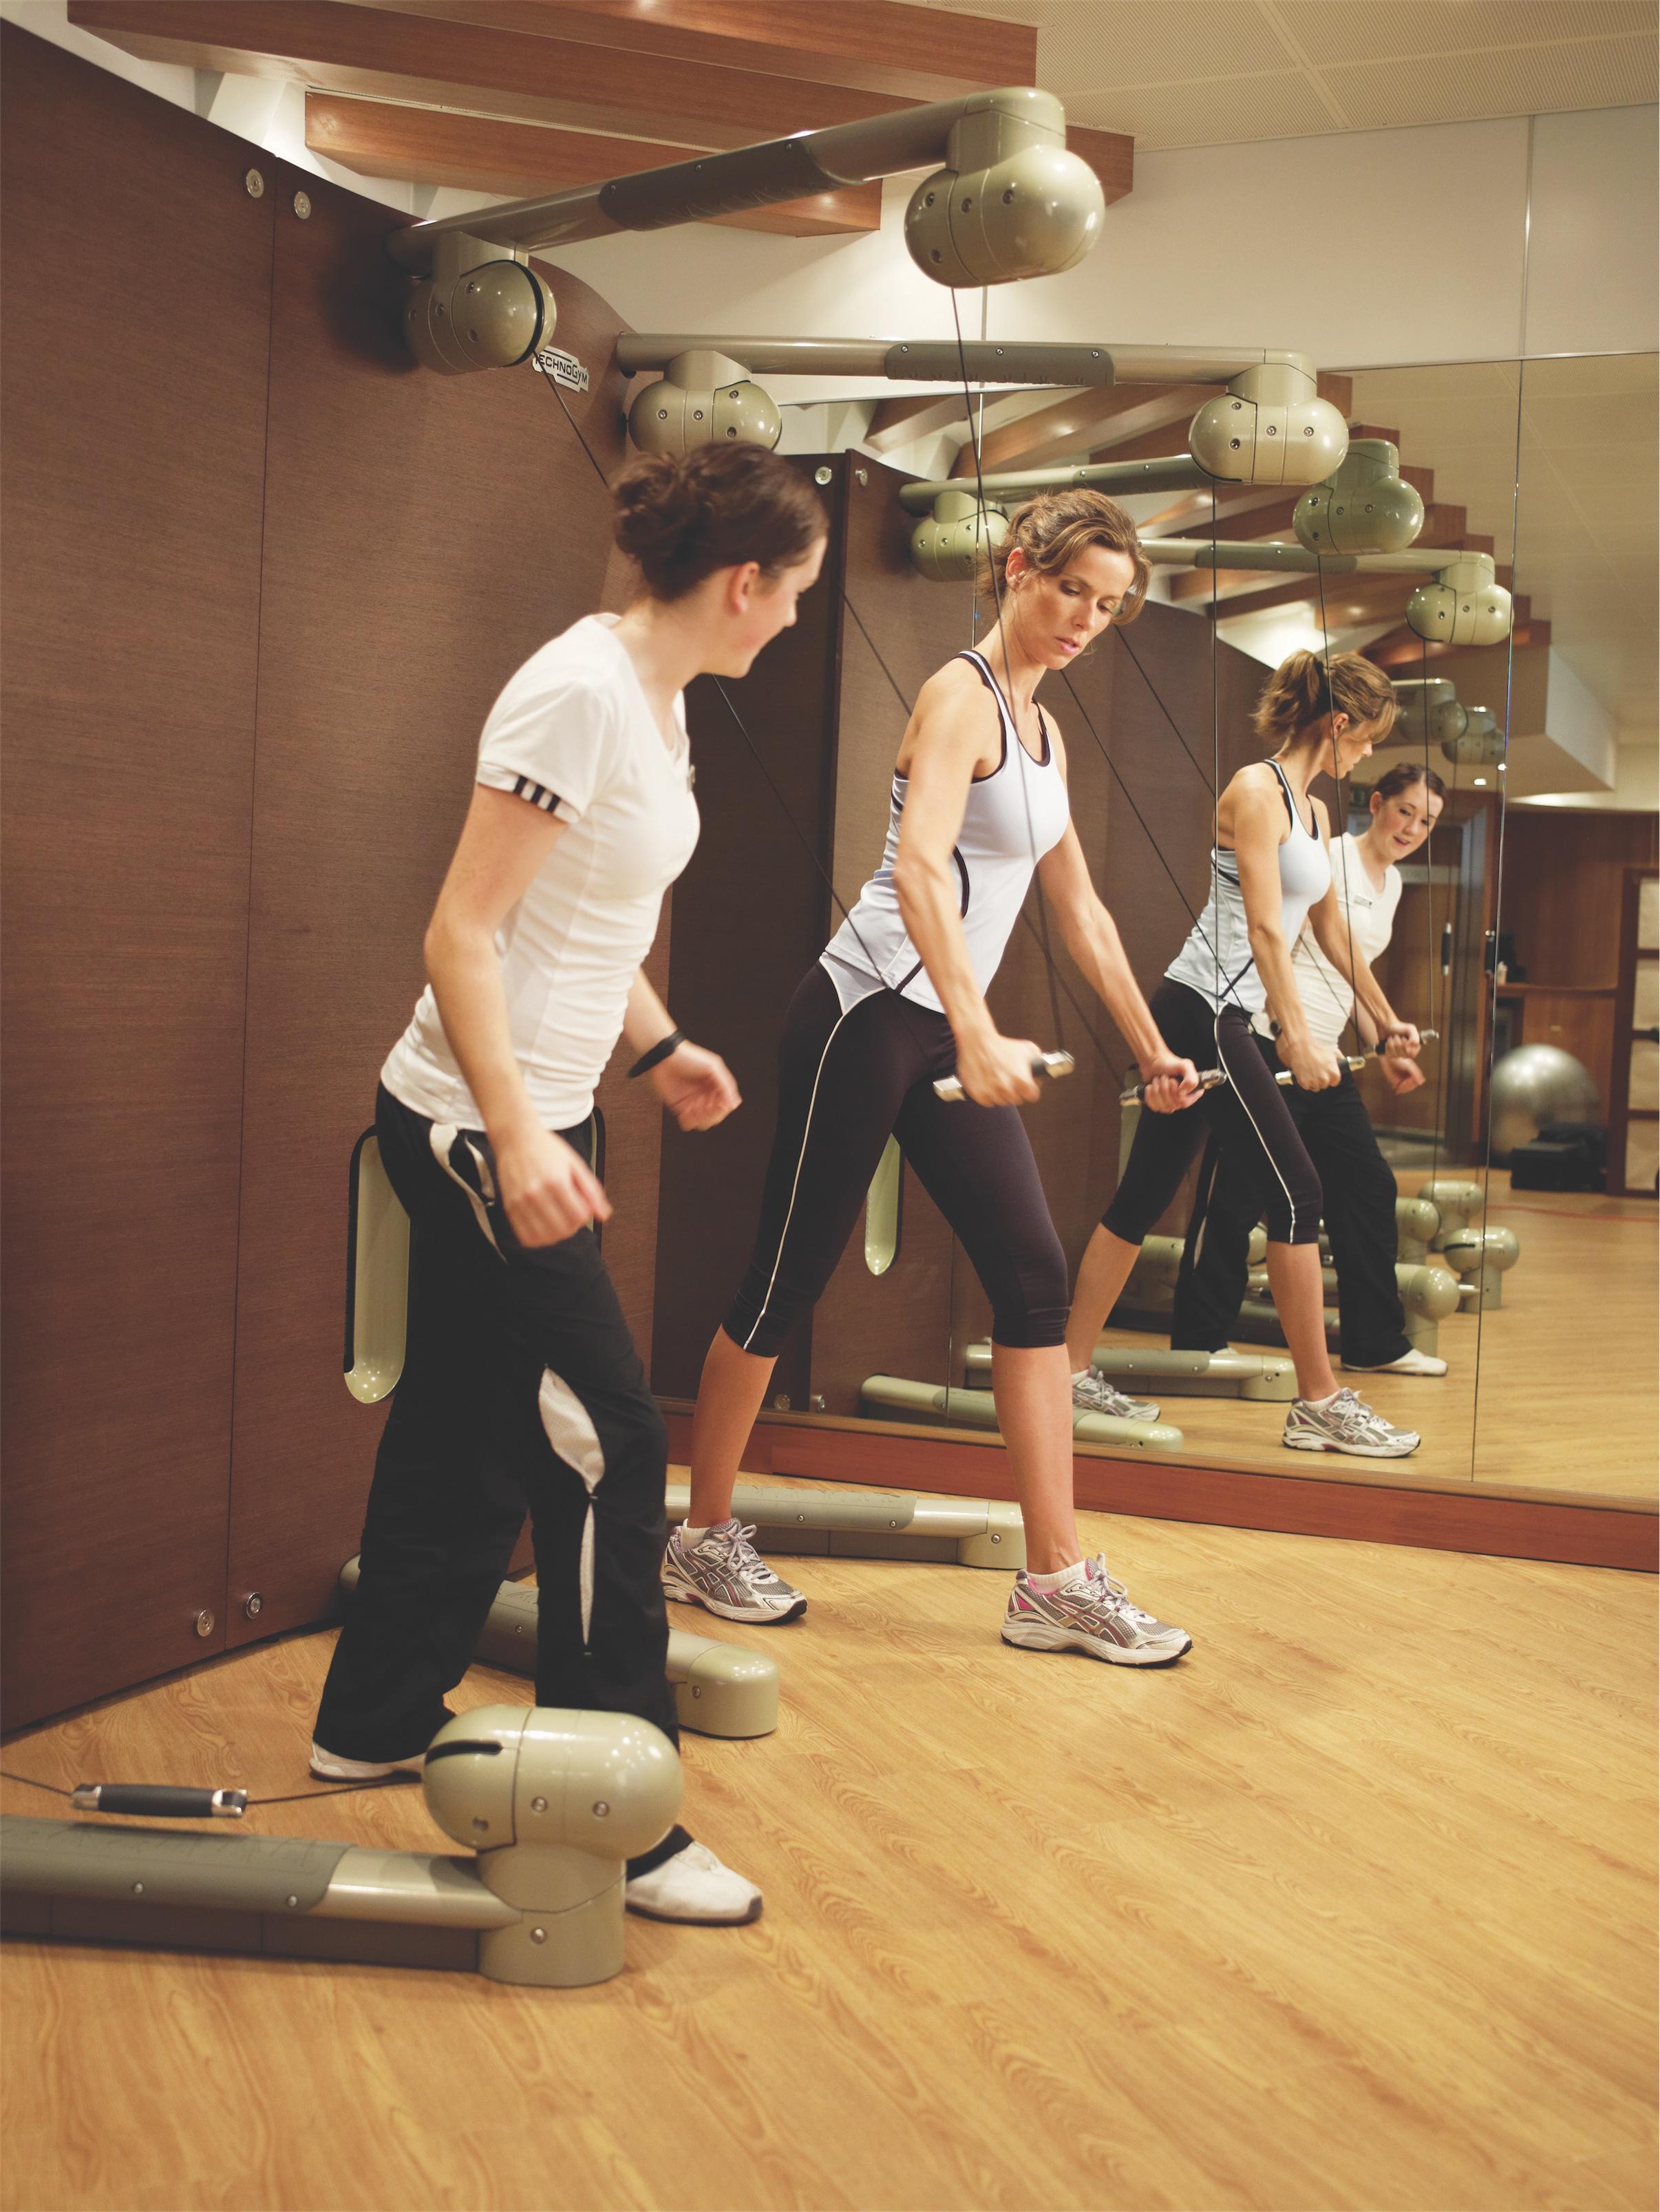 Seabourn Odyssey Class Interior Fitness Center 2.jpg